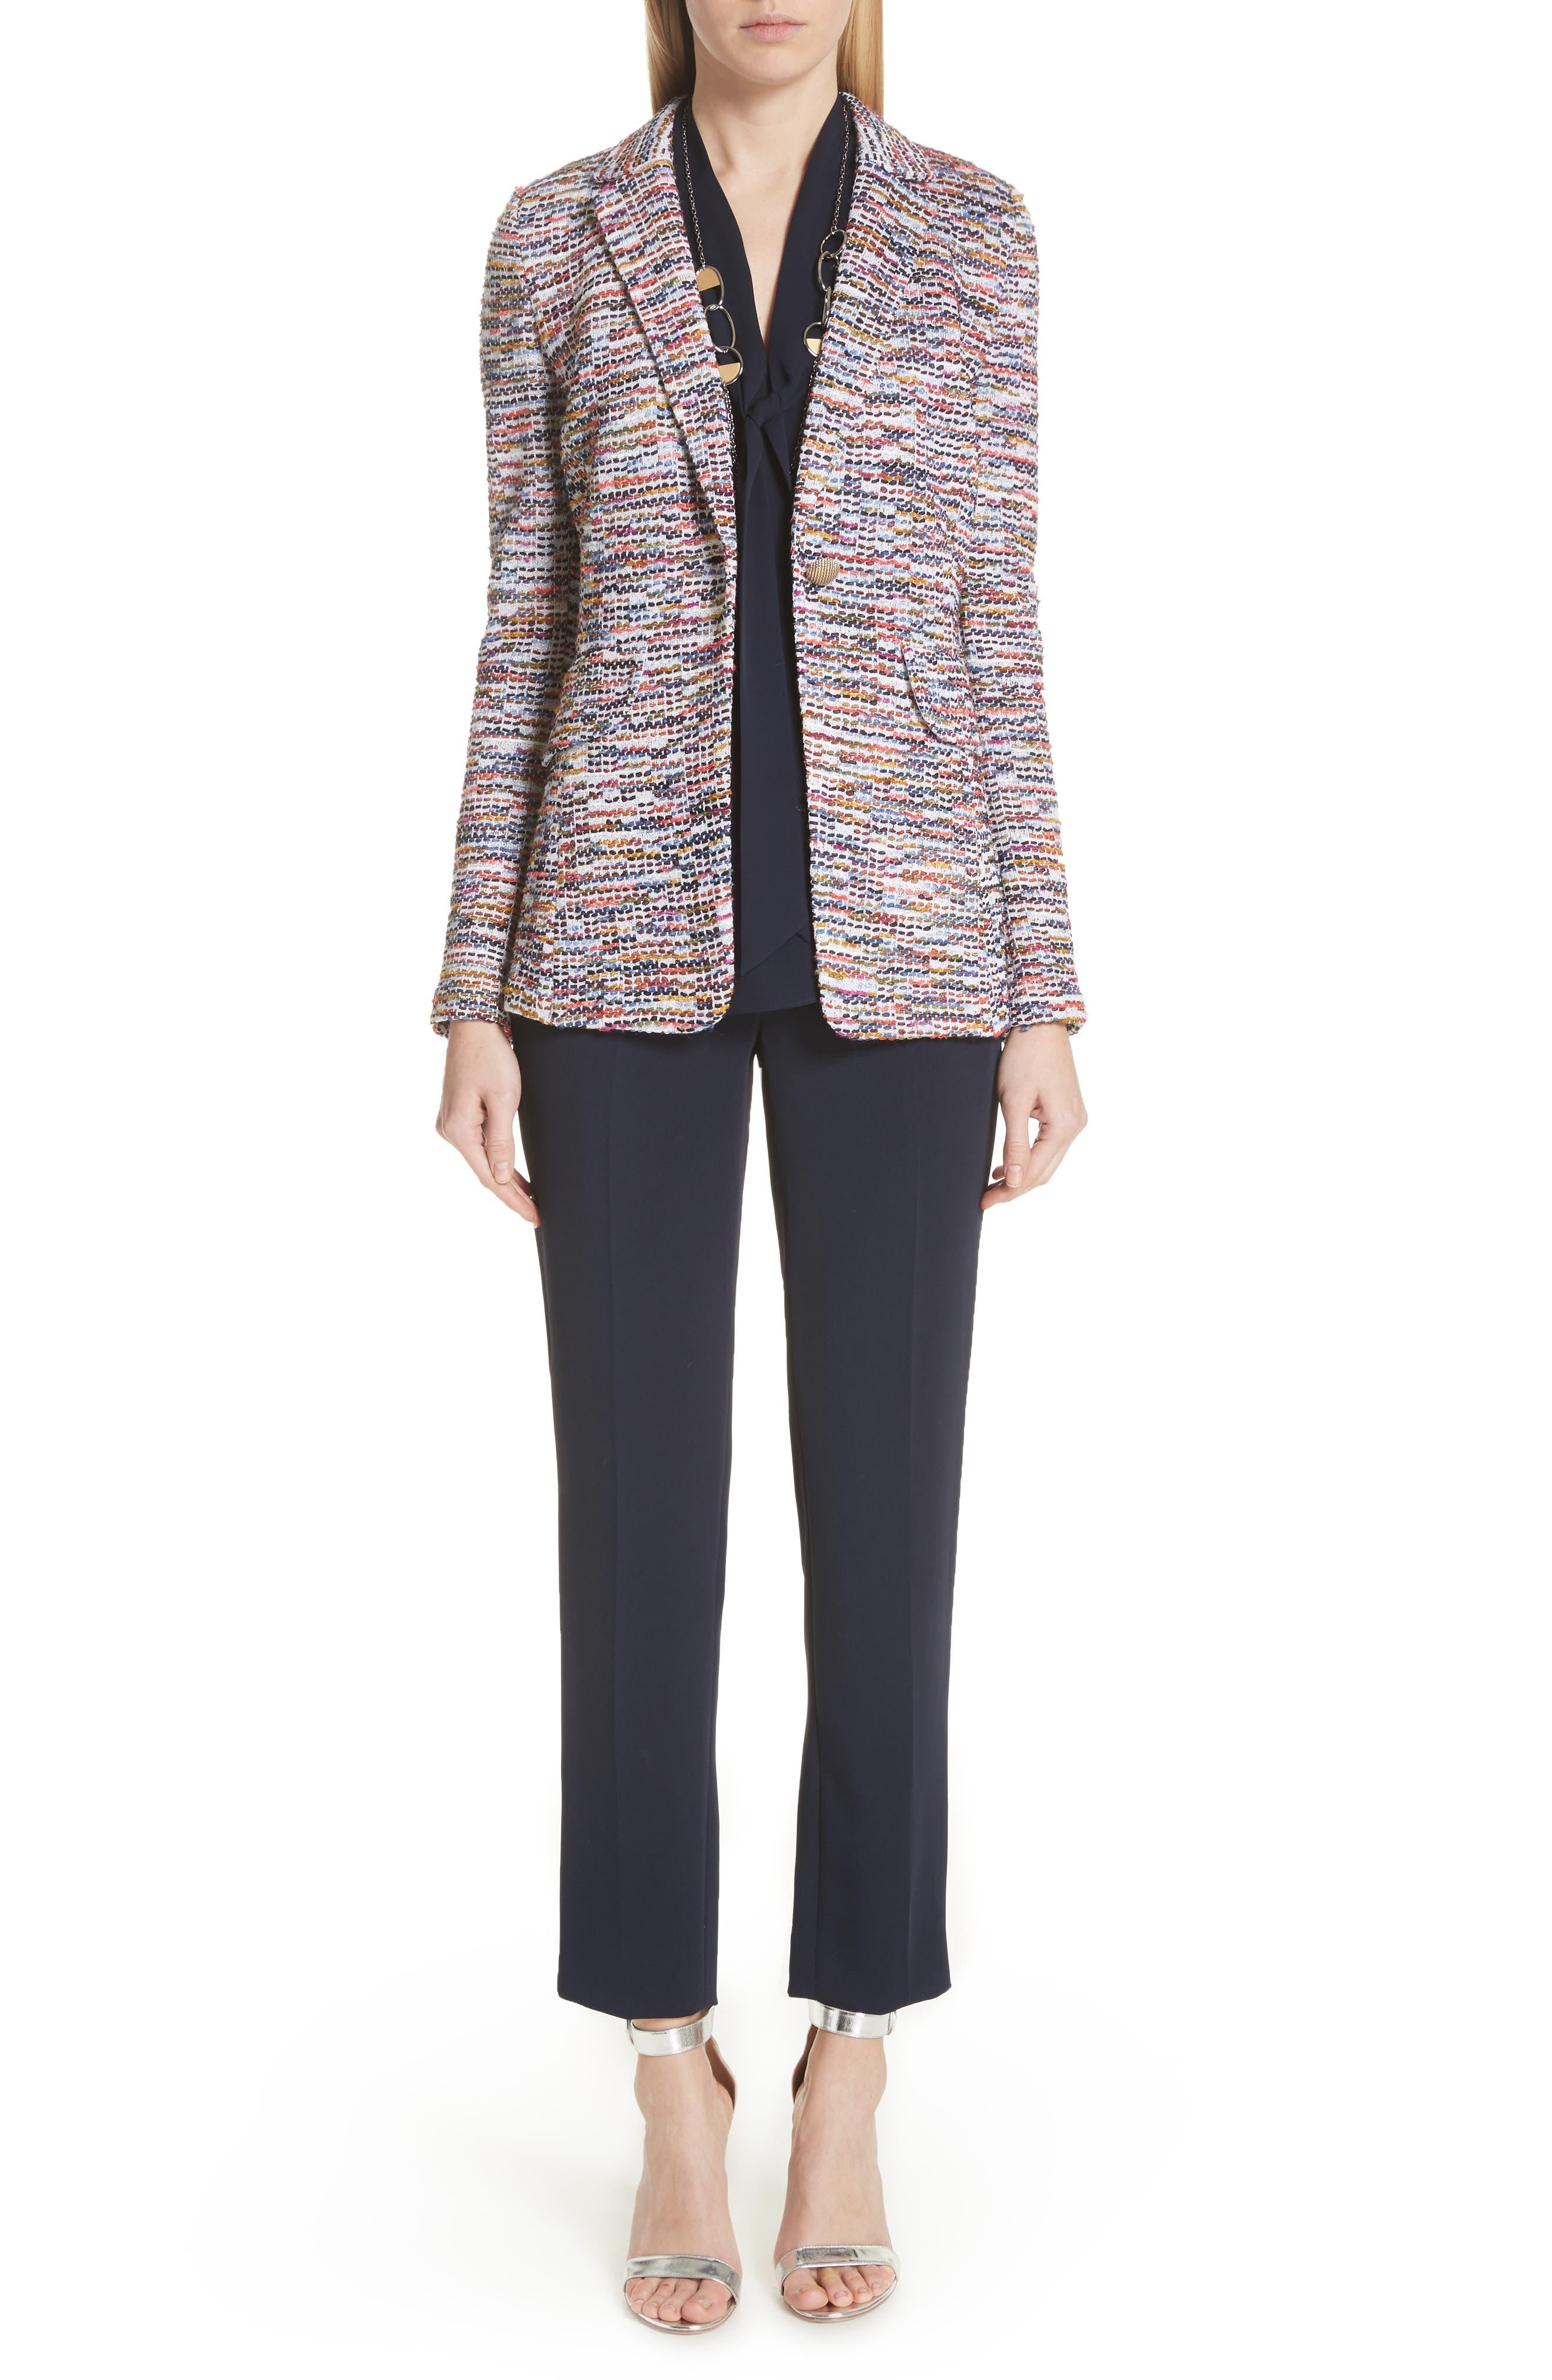 Vertical Fringe Multi Tweed Knit Jacket,                             Alternate thumbnail 8, color,                             Sienna Multi